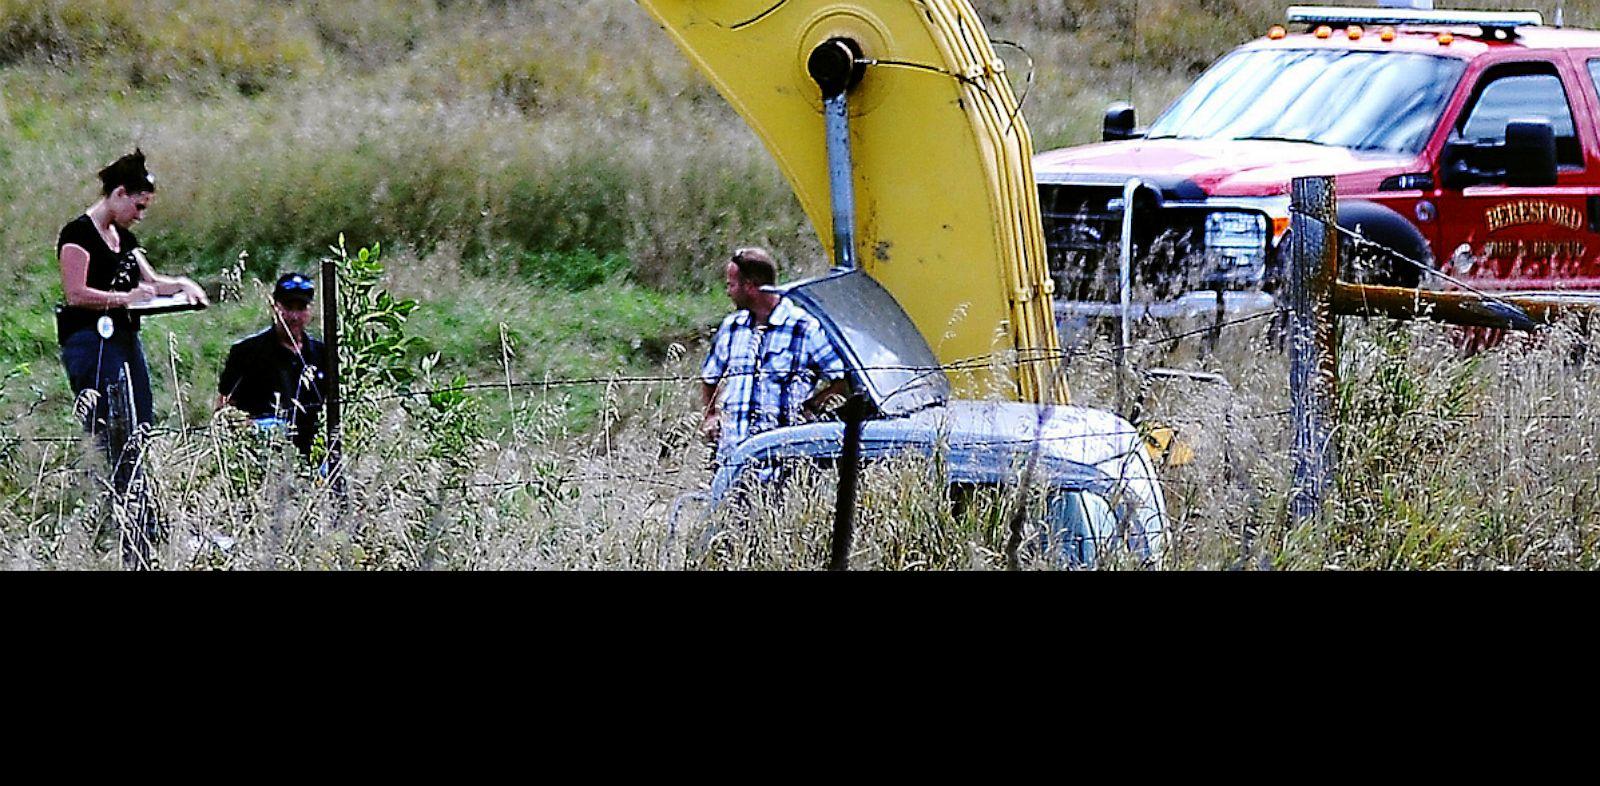 PHOTO: Vehicle being excavated